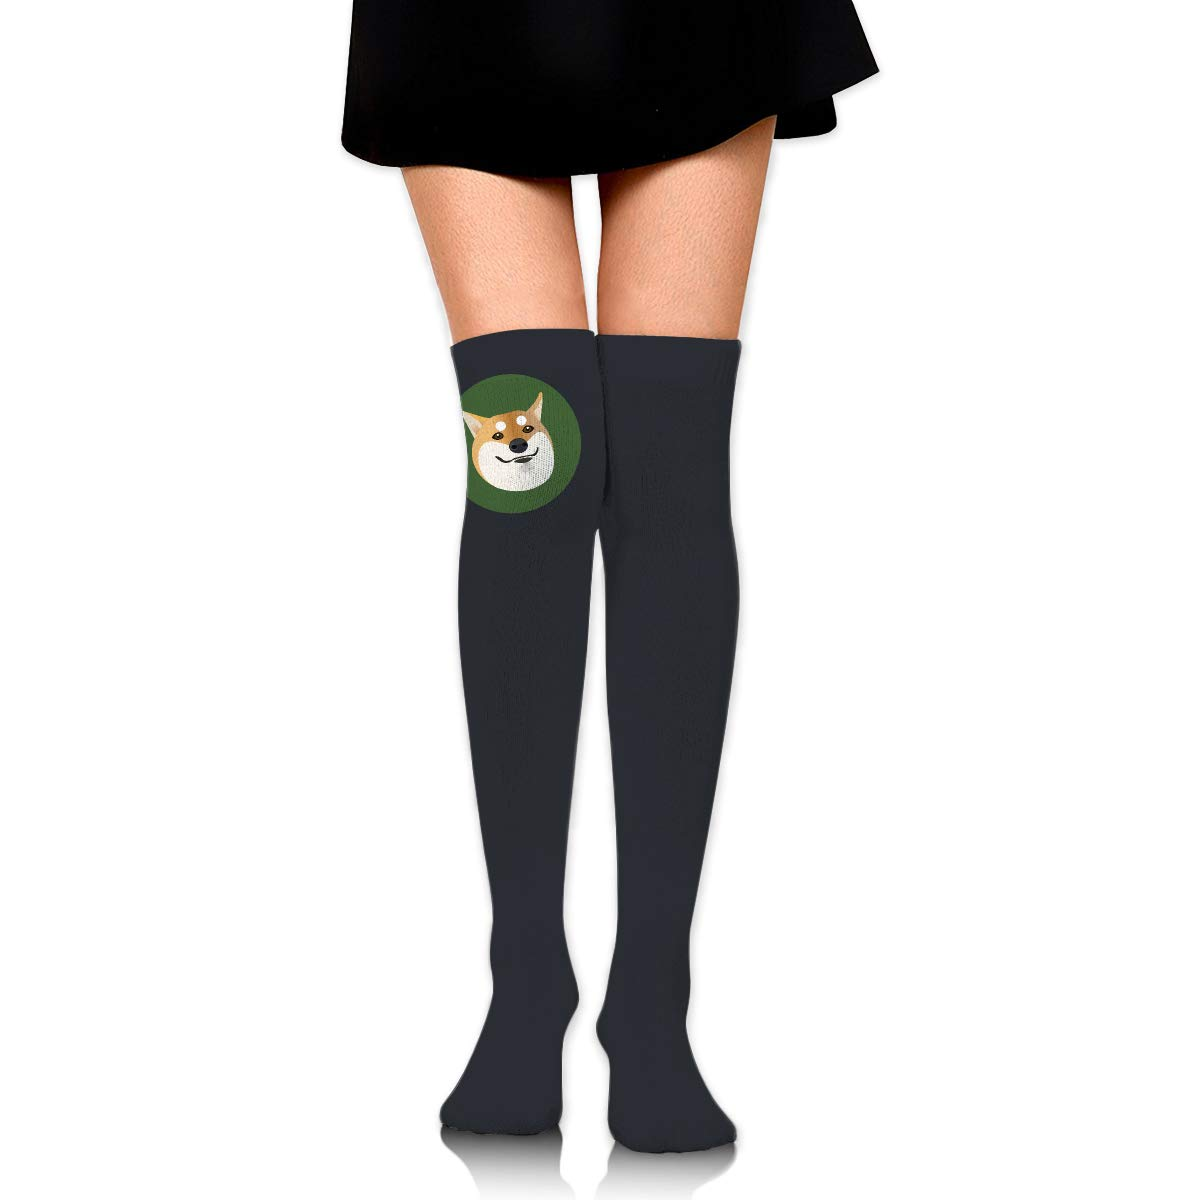 Shiba Inu Logo Long Tight Thigh High Socks Over The Knee High Boot Stockings Leg Warmers